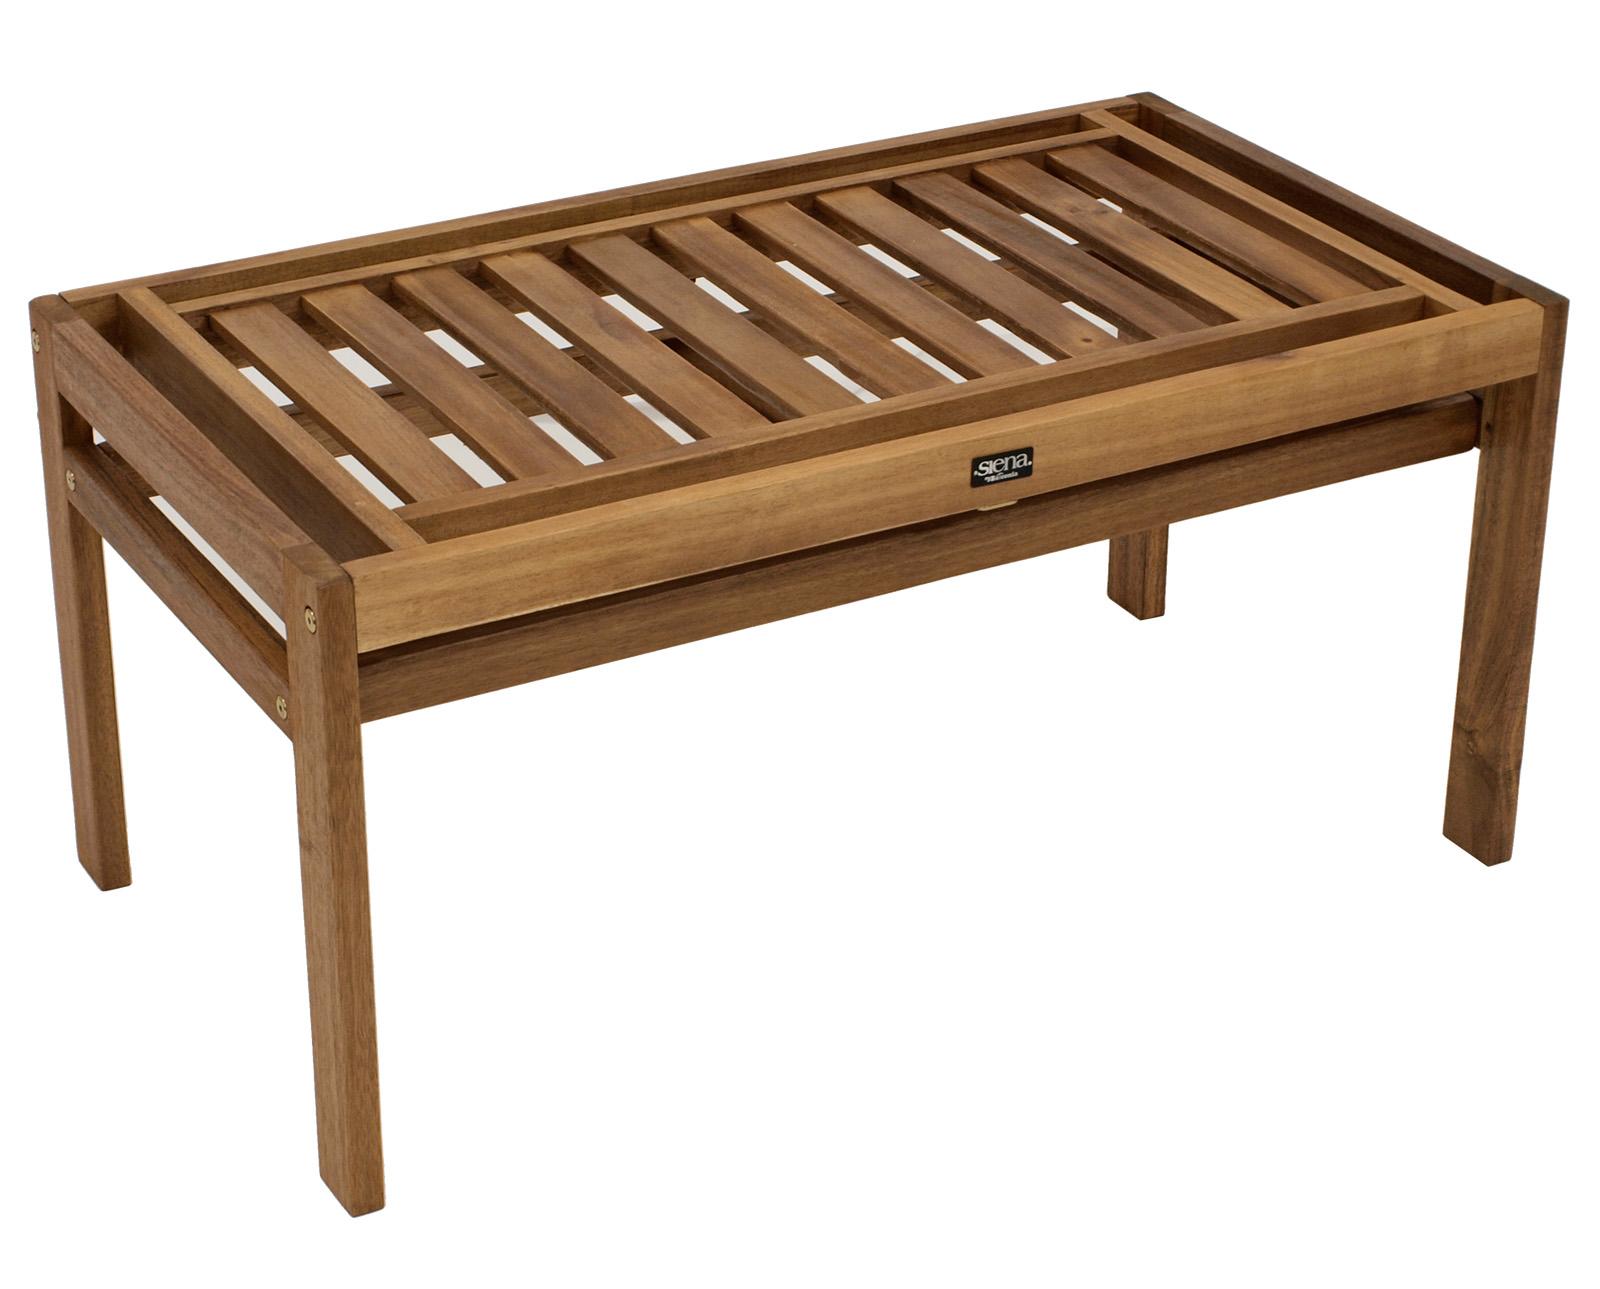 gartenbank sitzbank hockerbank gartenm bel bank modular 2 sitzer siena garden ebay. Black Bedroom Furniture Sets. Home Design Ideas